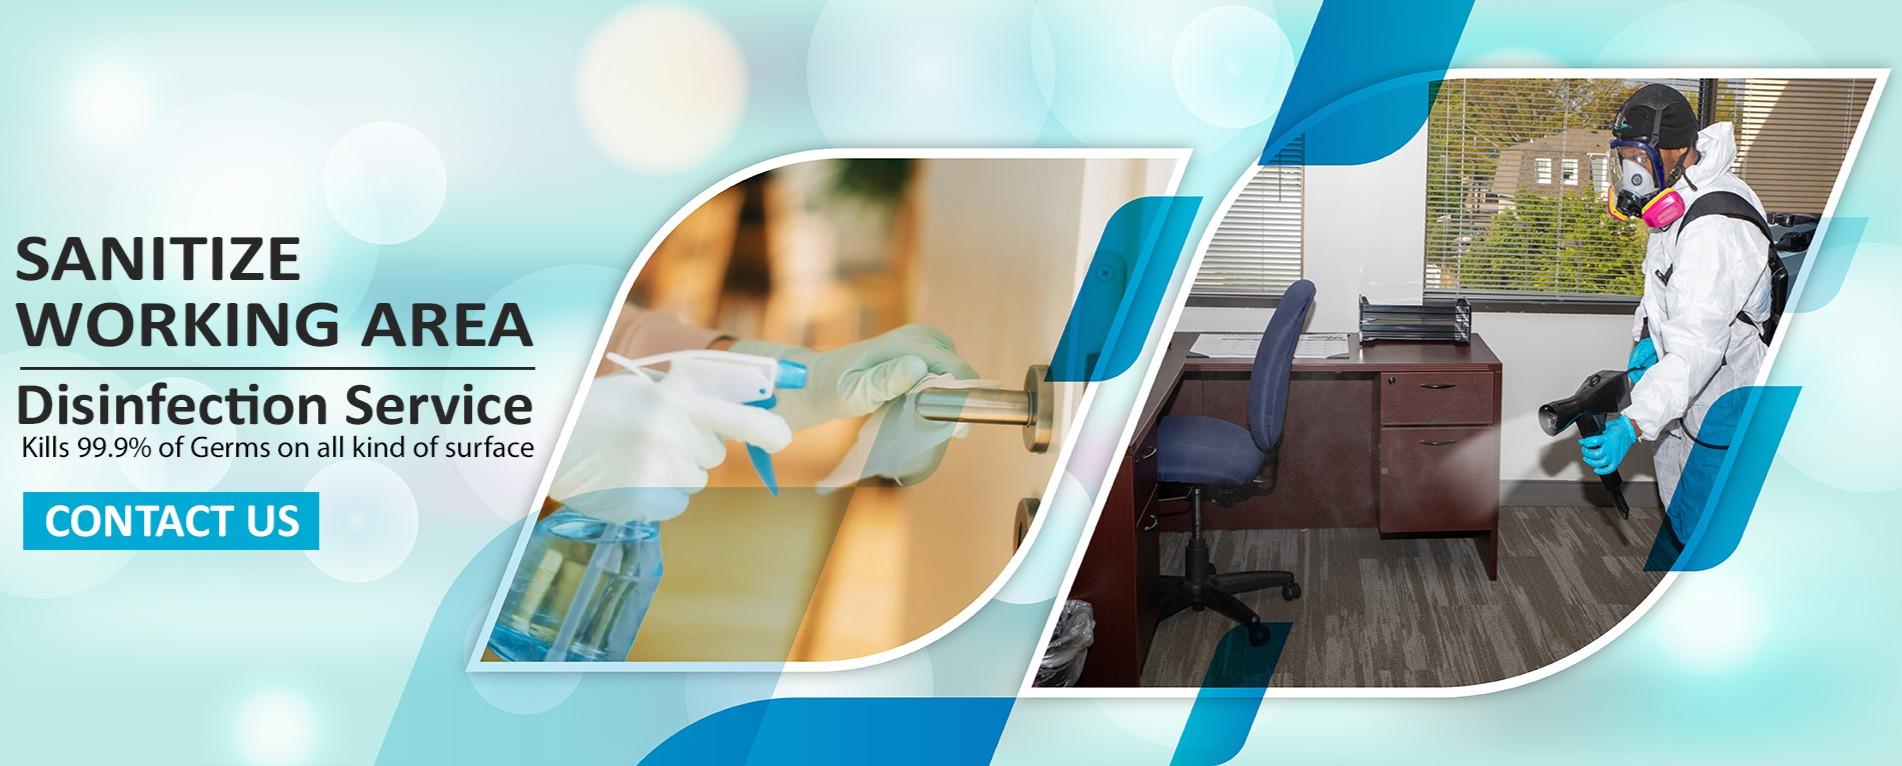 SafeHome Pestochem Pvt Ltd - Pest Control Services in Basharatpur, Gorakhpur